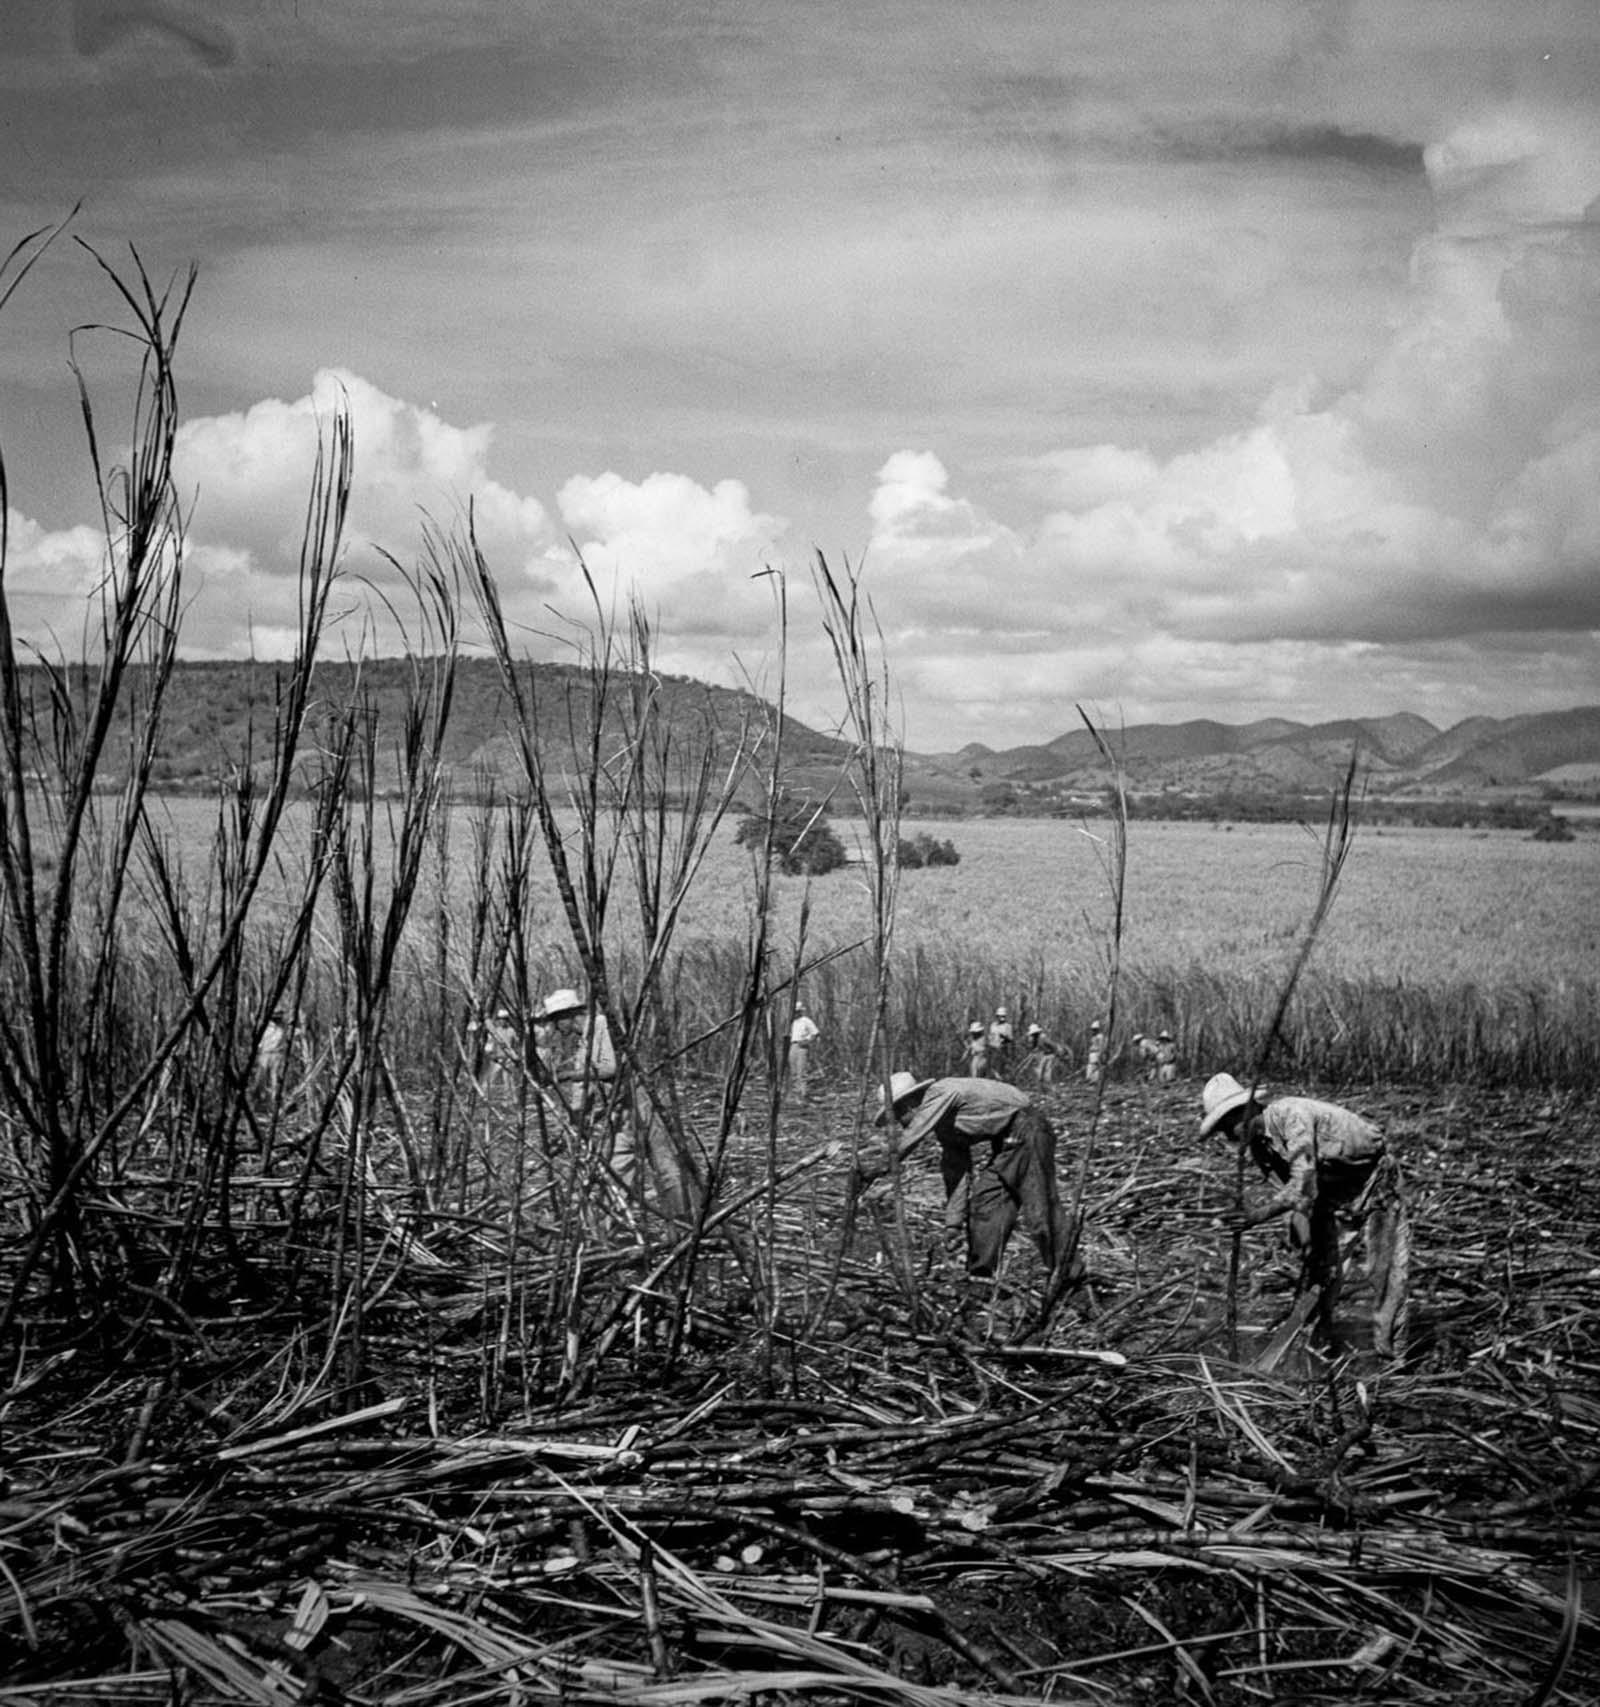 Laborers harvest sugarcane near Guanica.